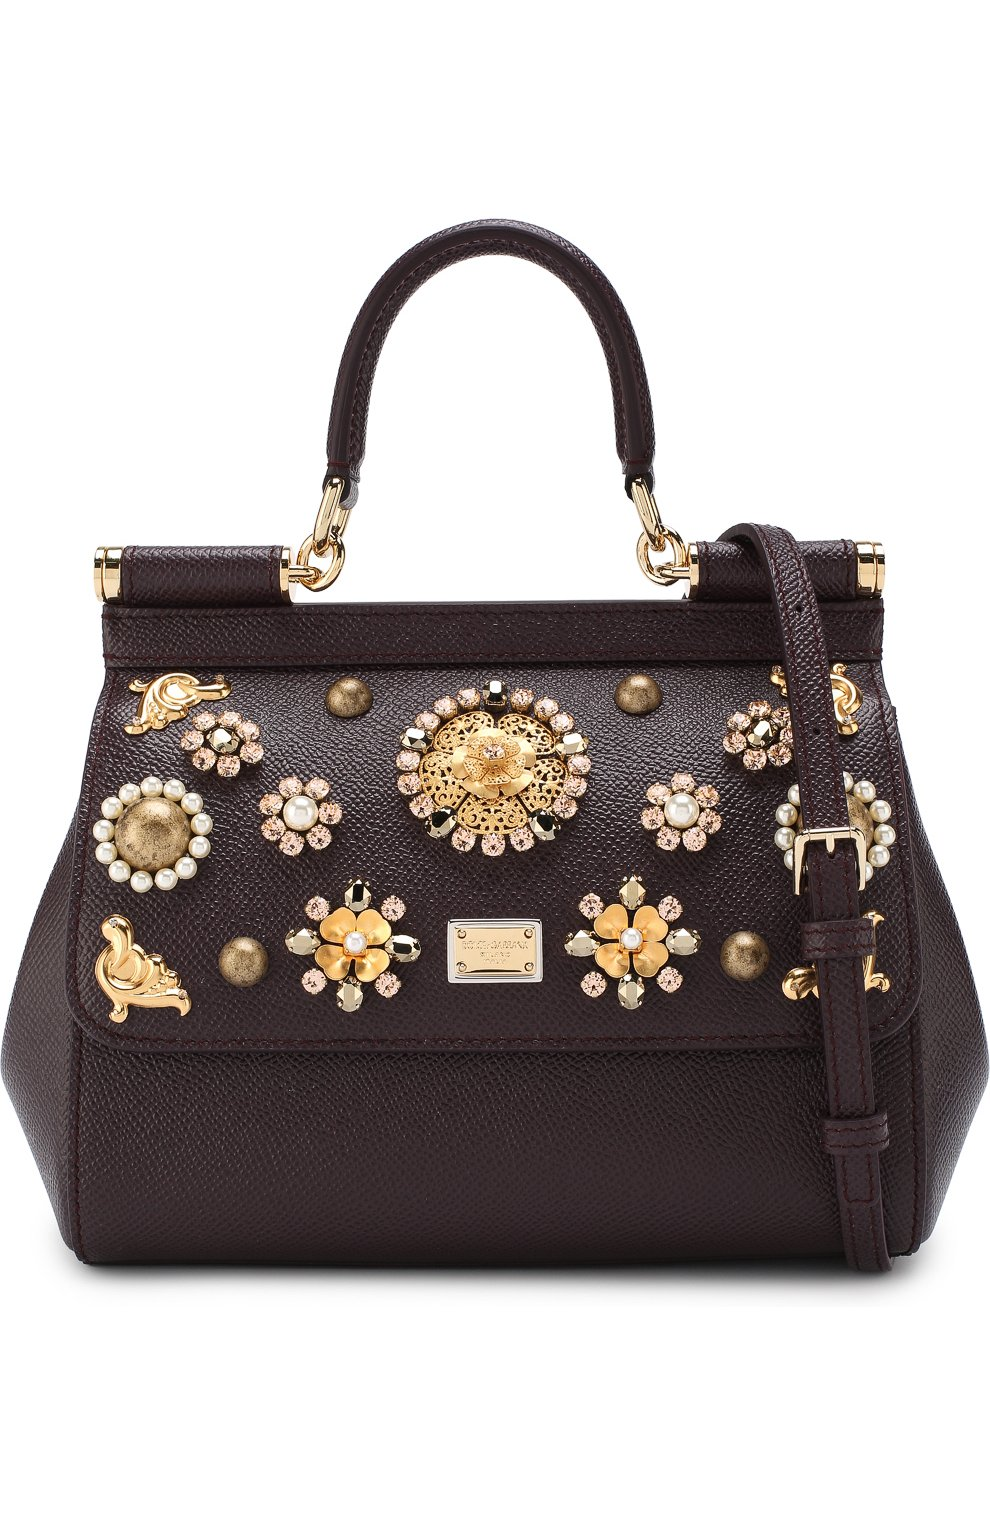 Женская сумка sicily small с аппликациями DOLCE & GABBANA бордового цвета, арт. BB6003/B5230 | Фото 6